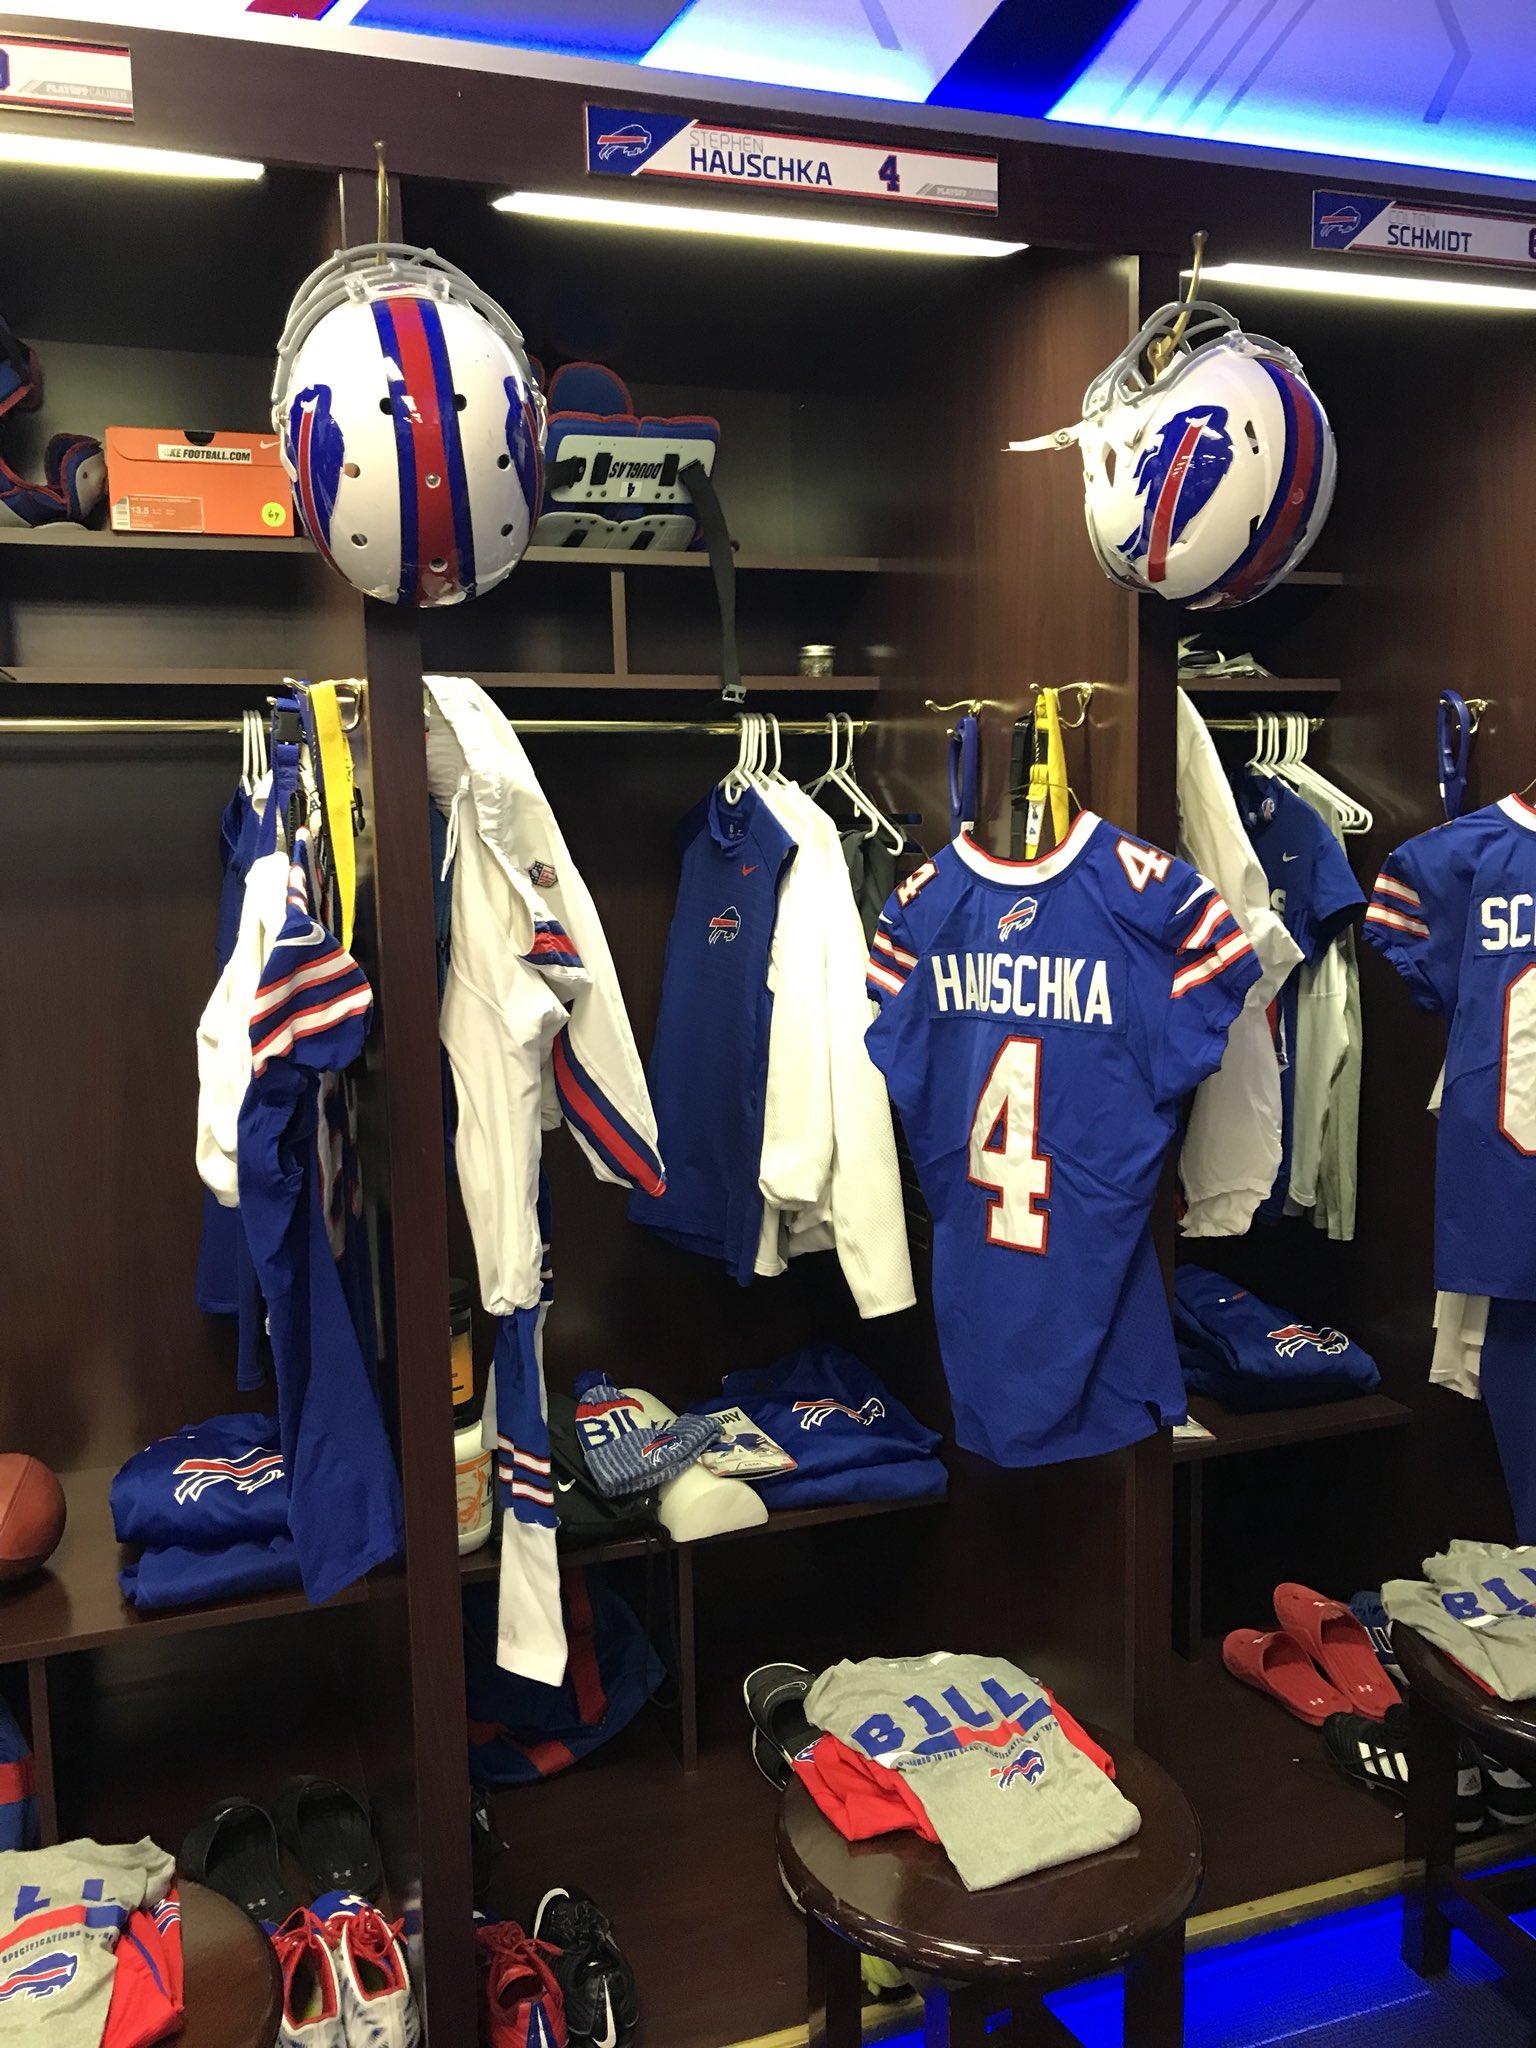 Blue jerseys white pants tomorrow at home v Miami Go #Bills https://t.co/wT4hgR8zsR